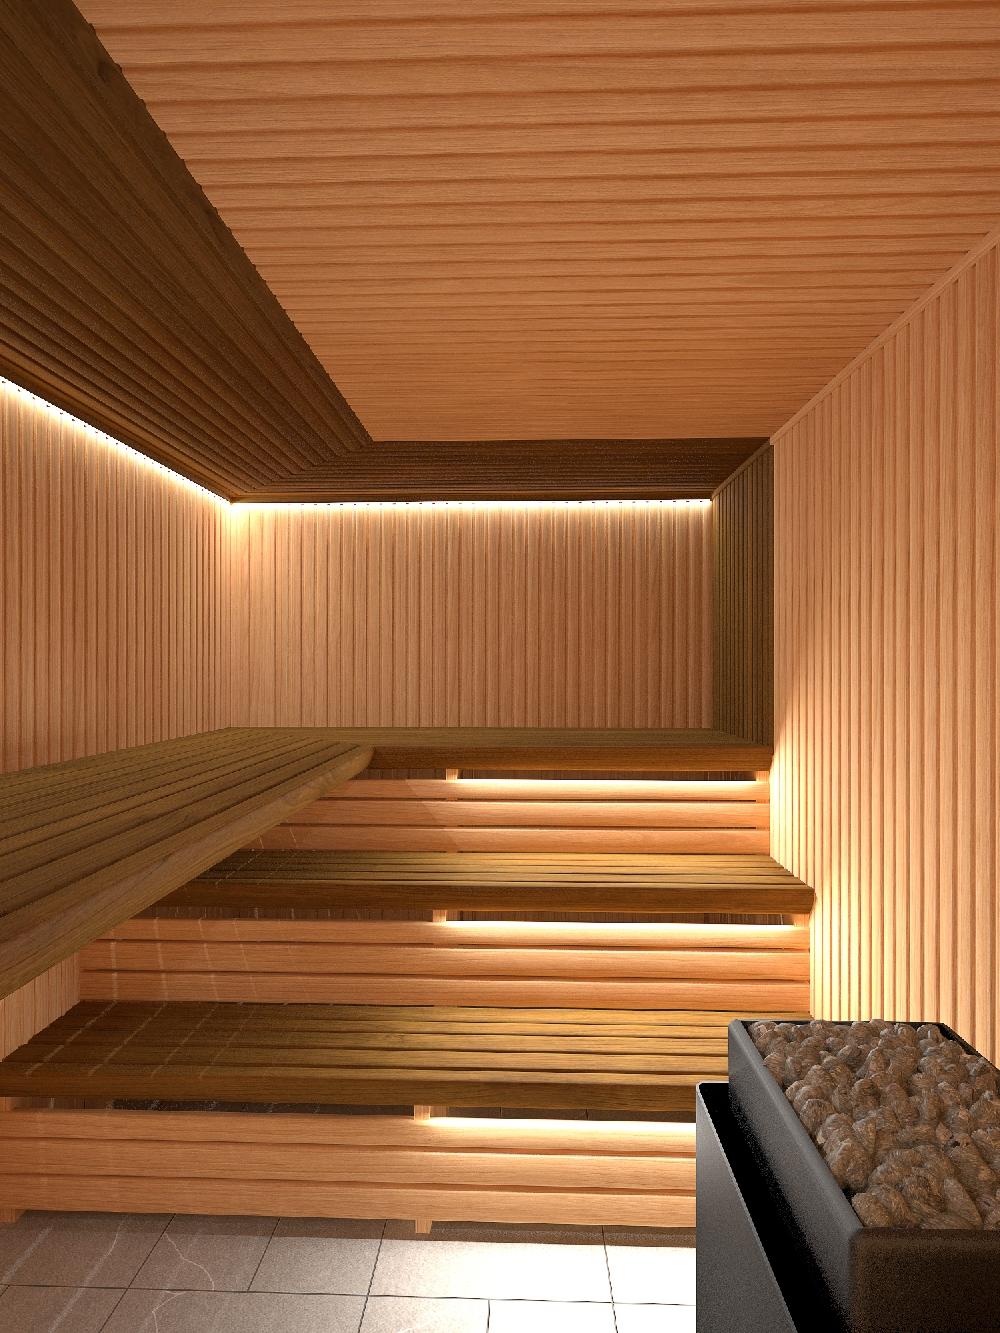 Sauna Project By Artom Bugo At